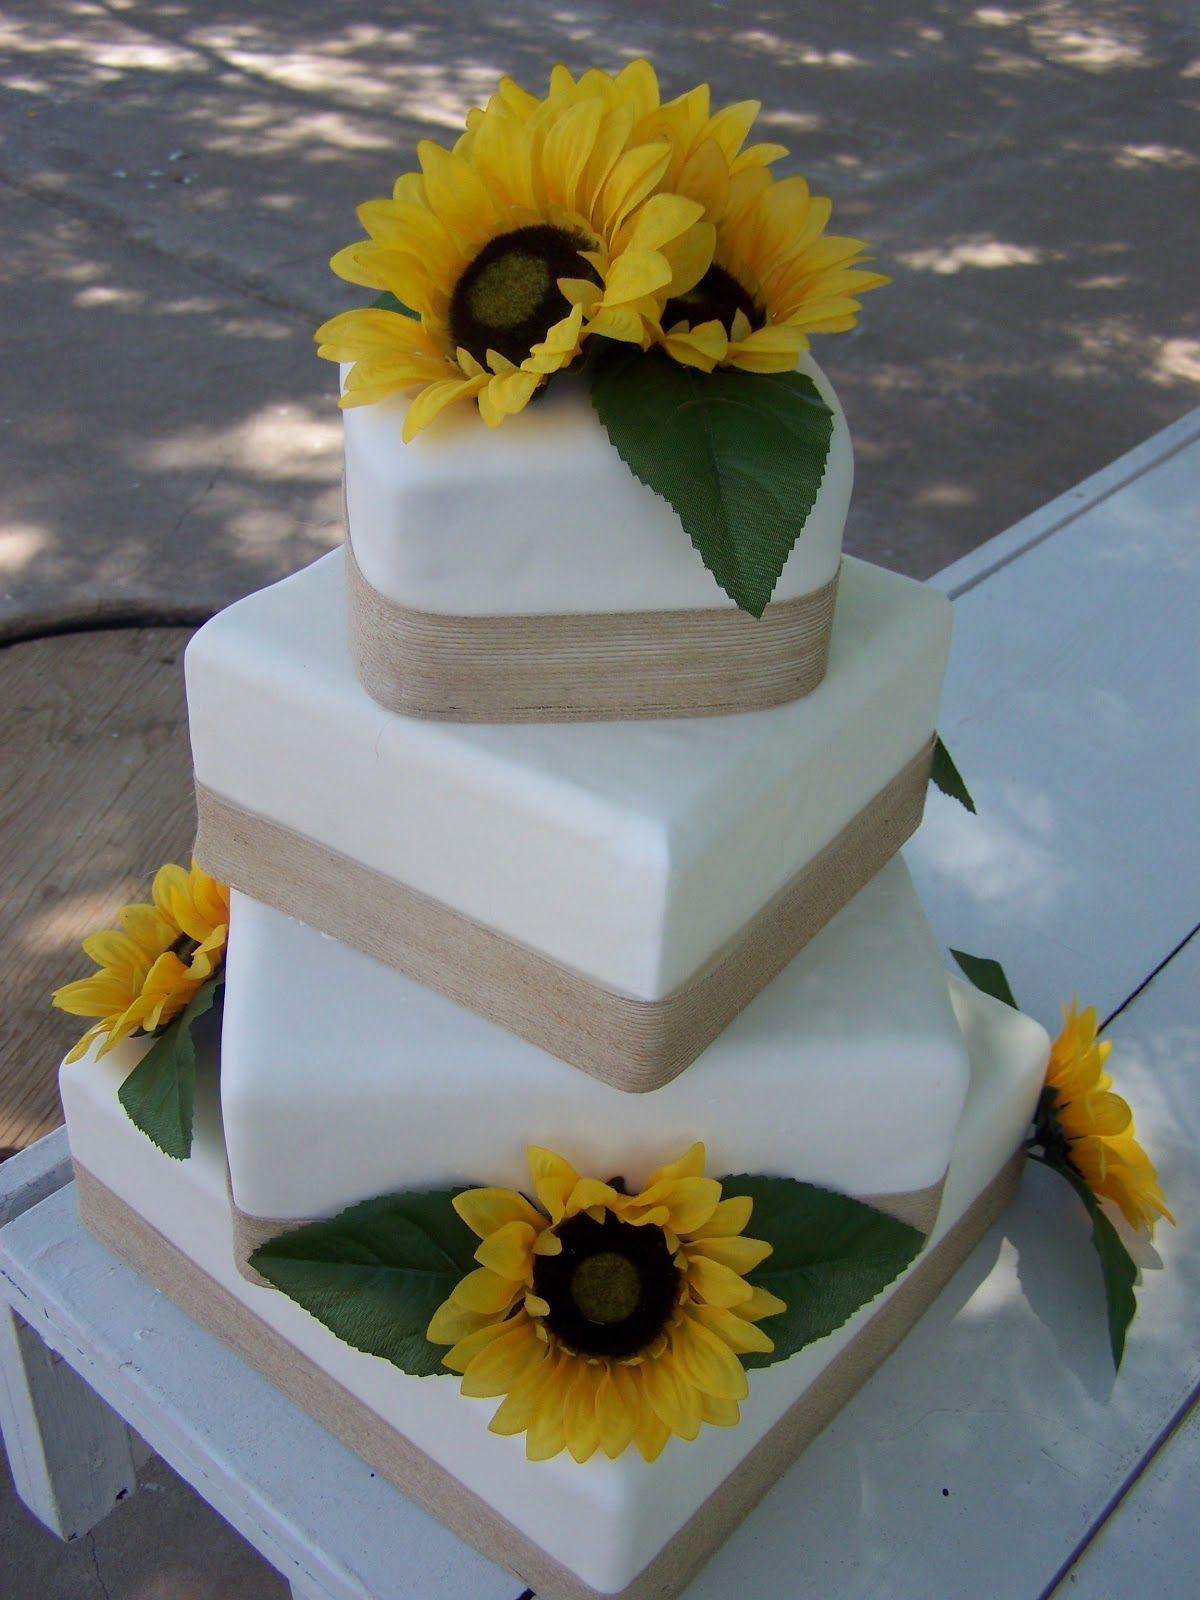 CakeALicious Sunflower & Burlap Wedding Cake Birthday